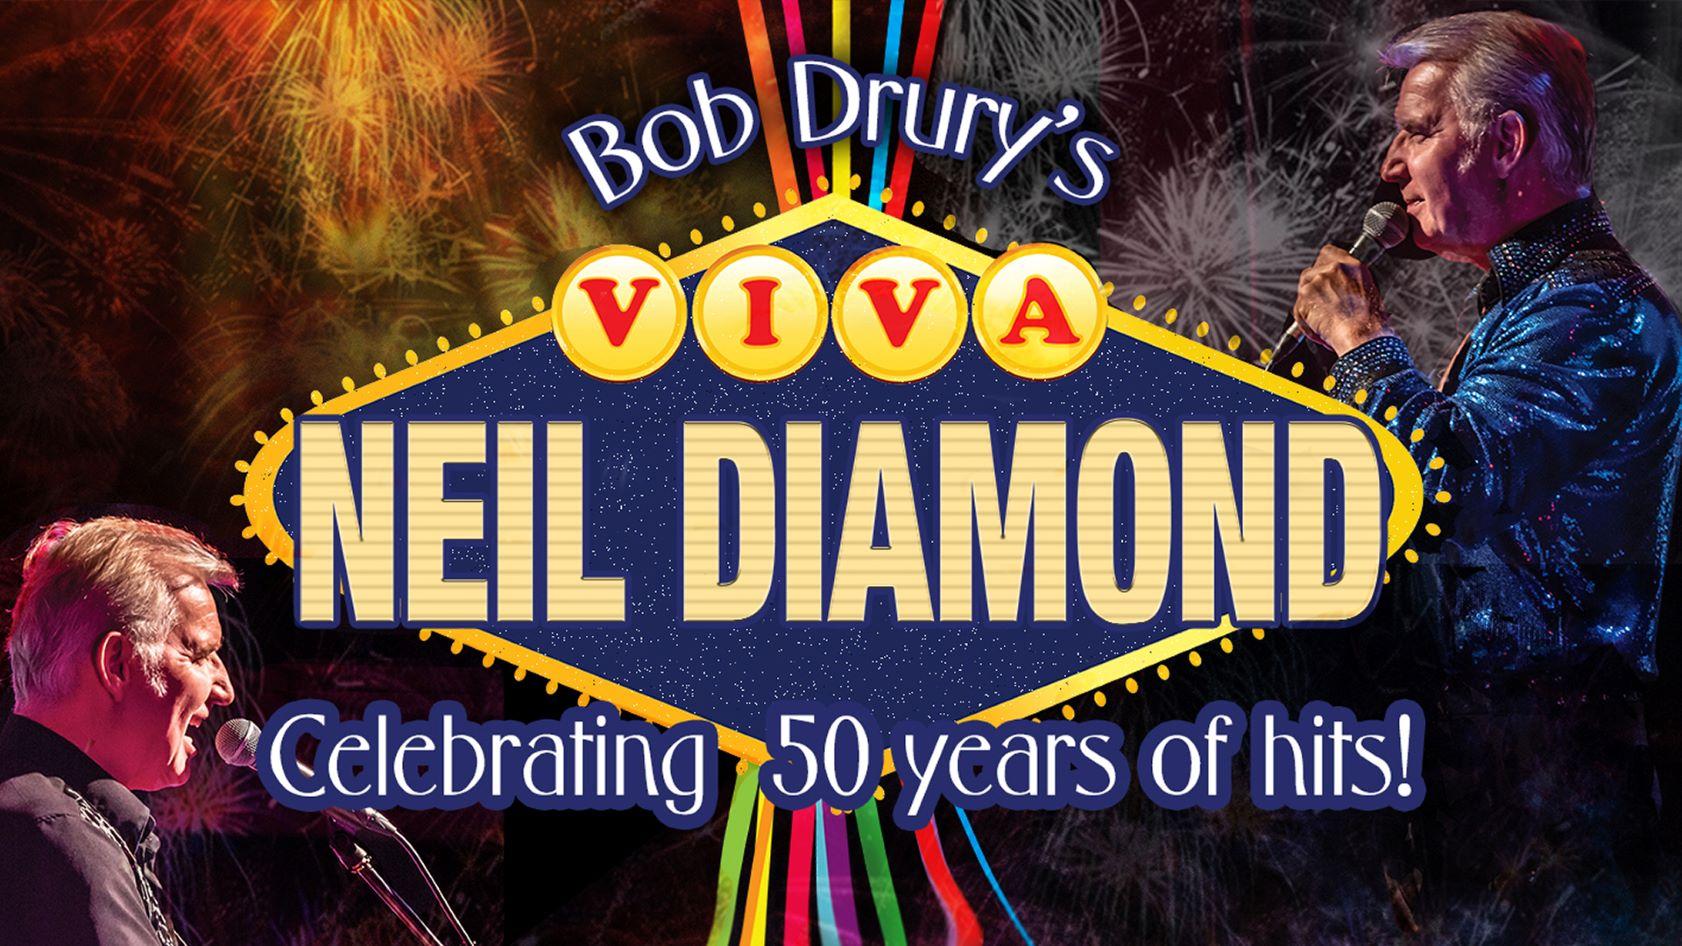 Bob_Drury_Viva_Neil_Diamond_Slide